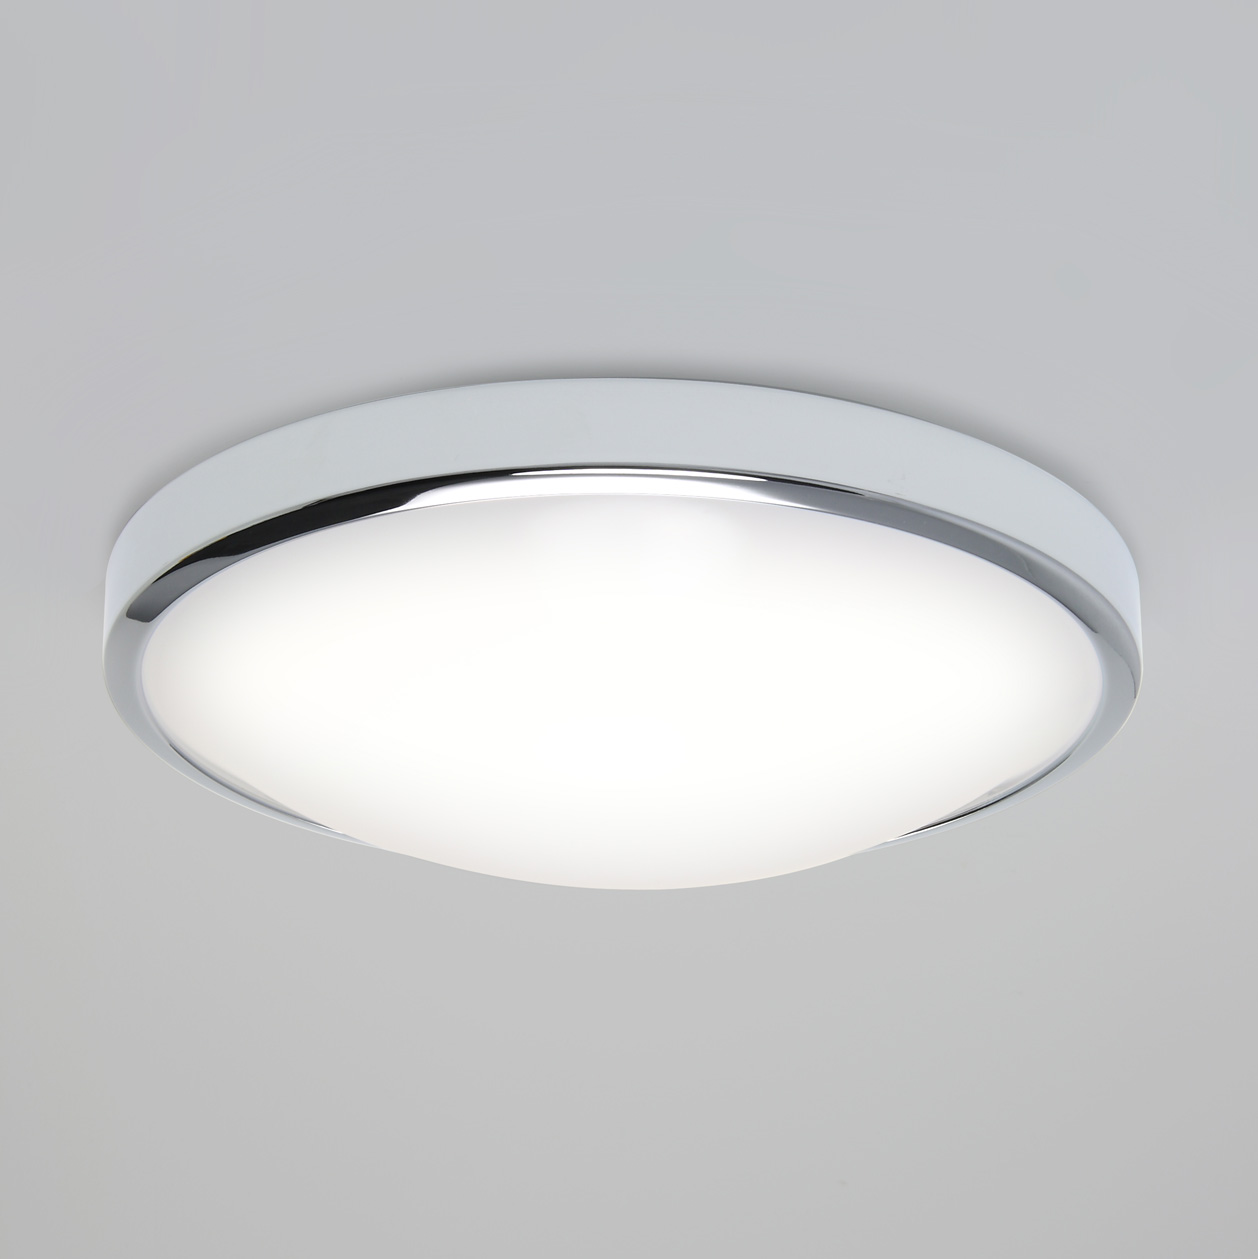 Astro Osaka 350 LED Round Bathroom Ceiling Wall Light